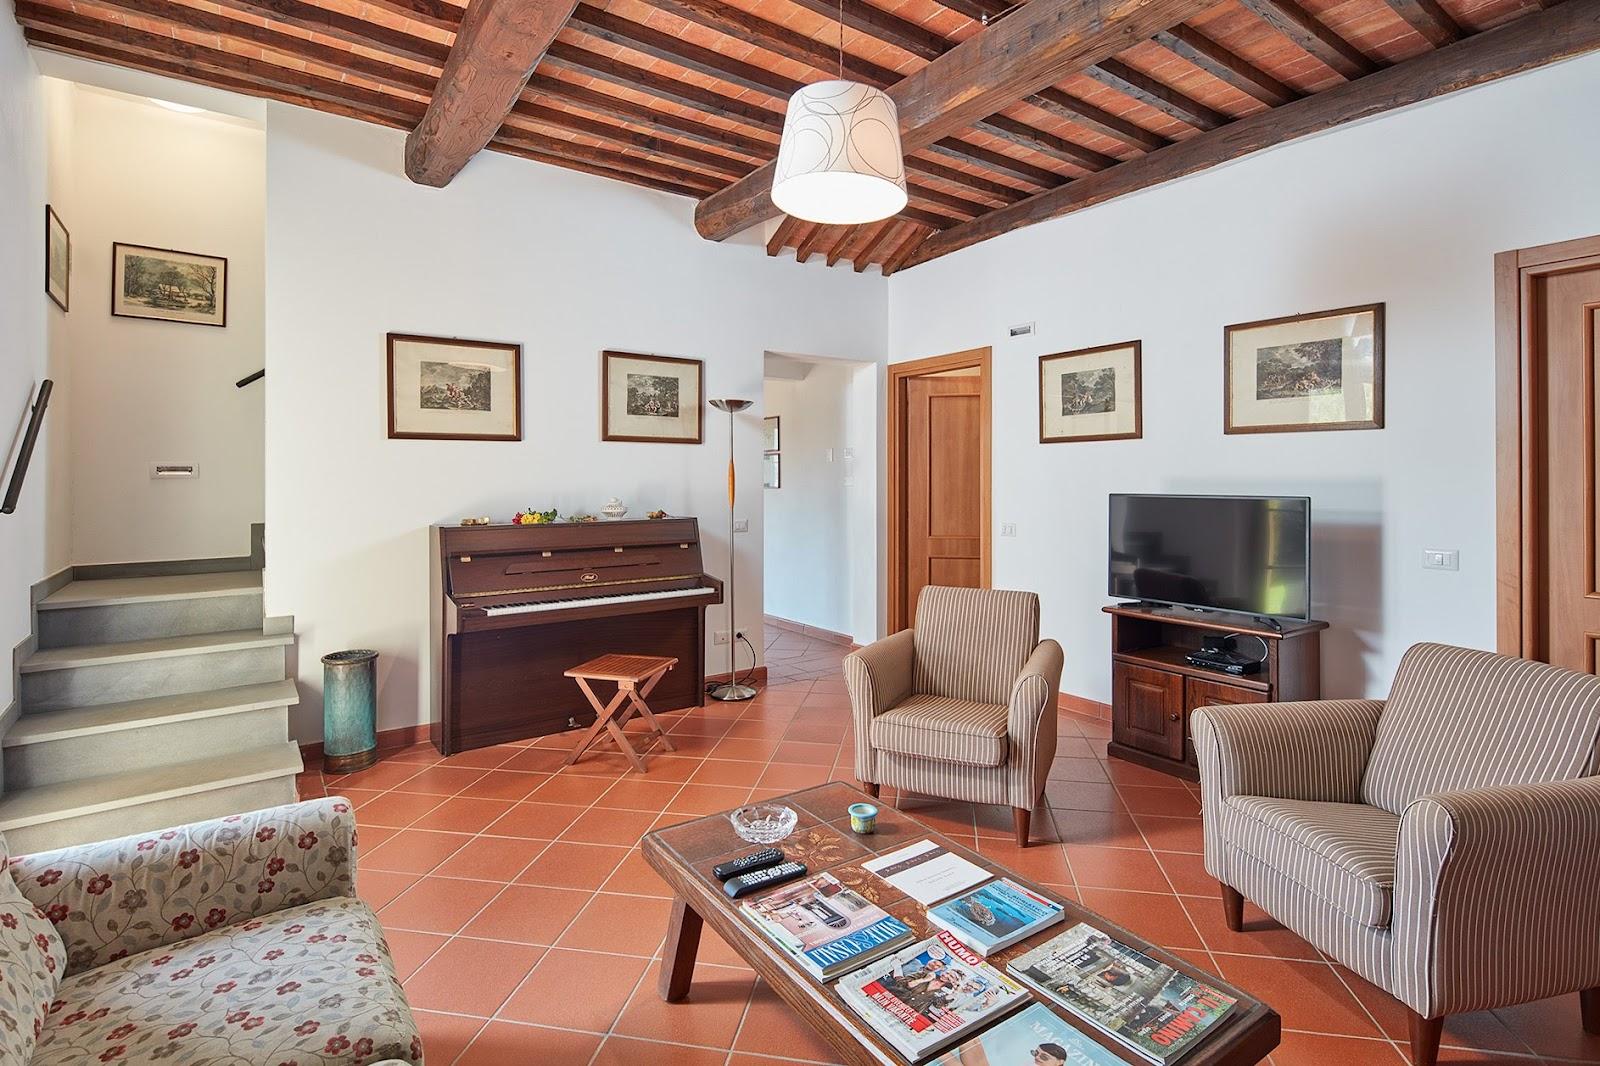 Ferienhaus Corte Paradiso (2570342), Monsummano Terme, Pistoia, Toskana, Italien, Bild 17